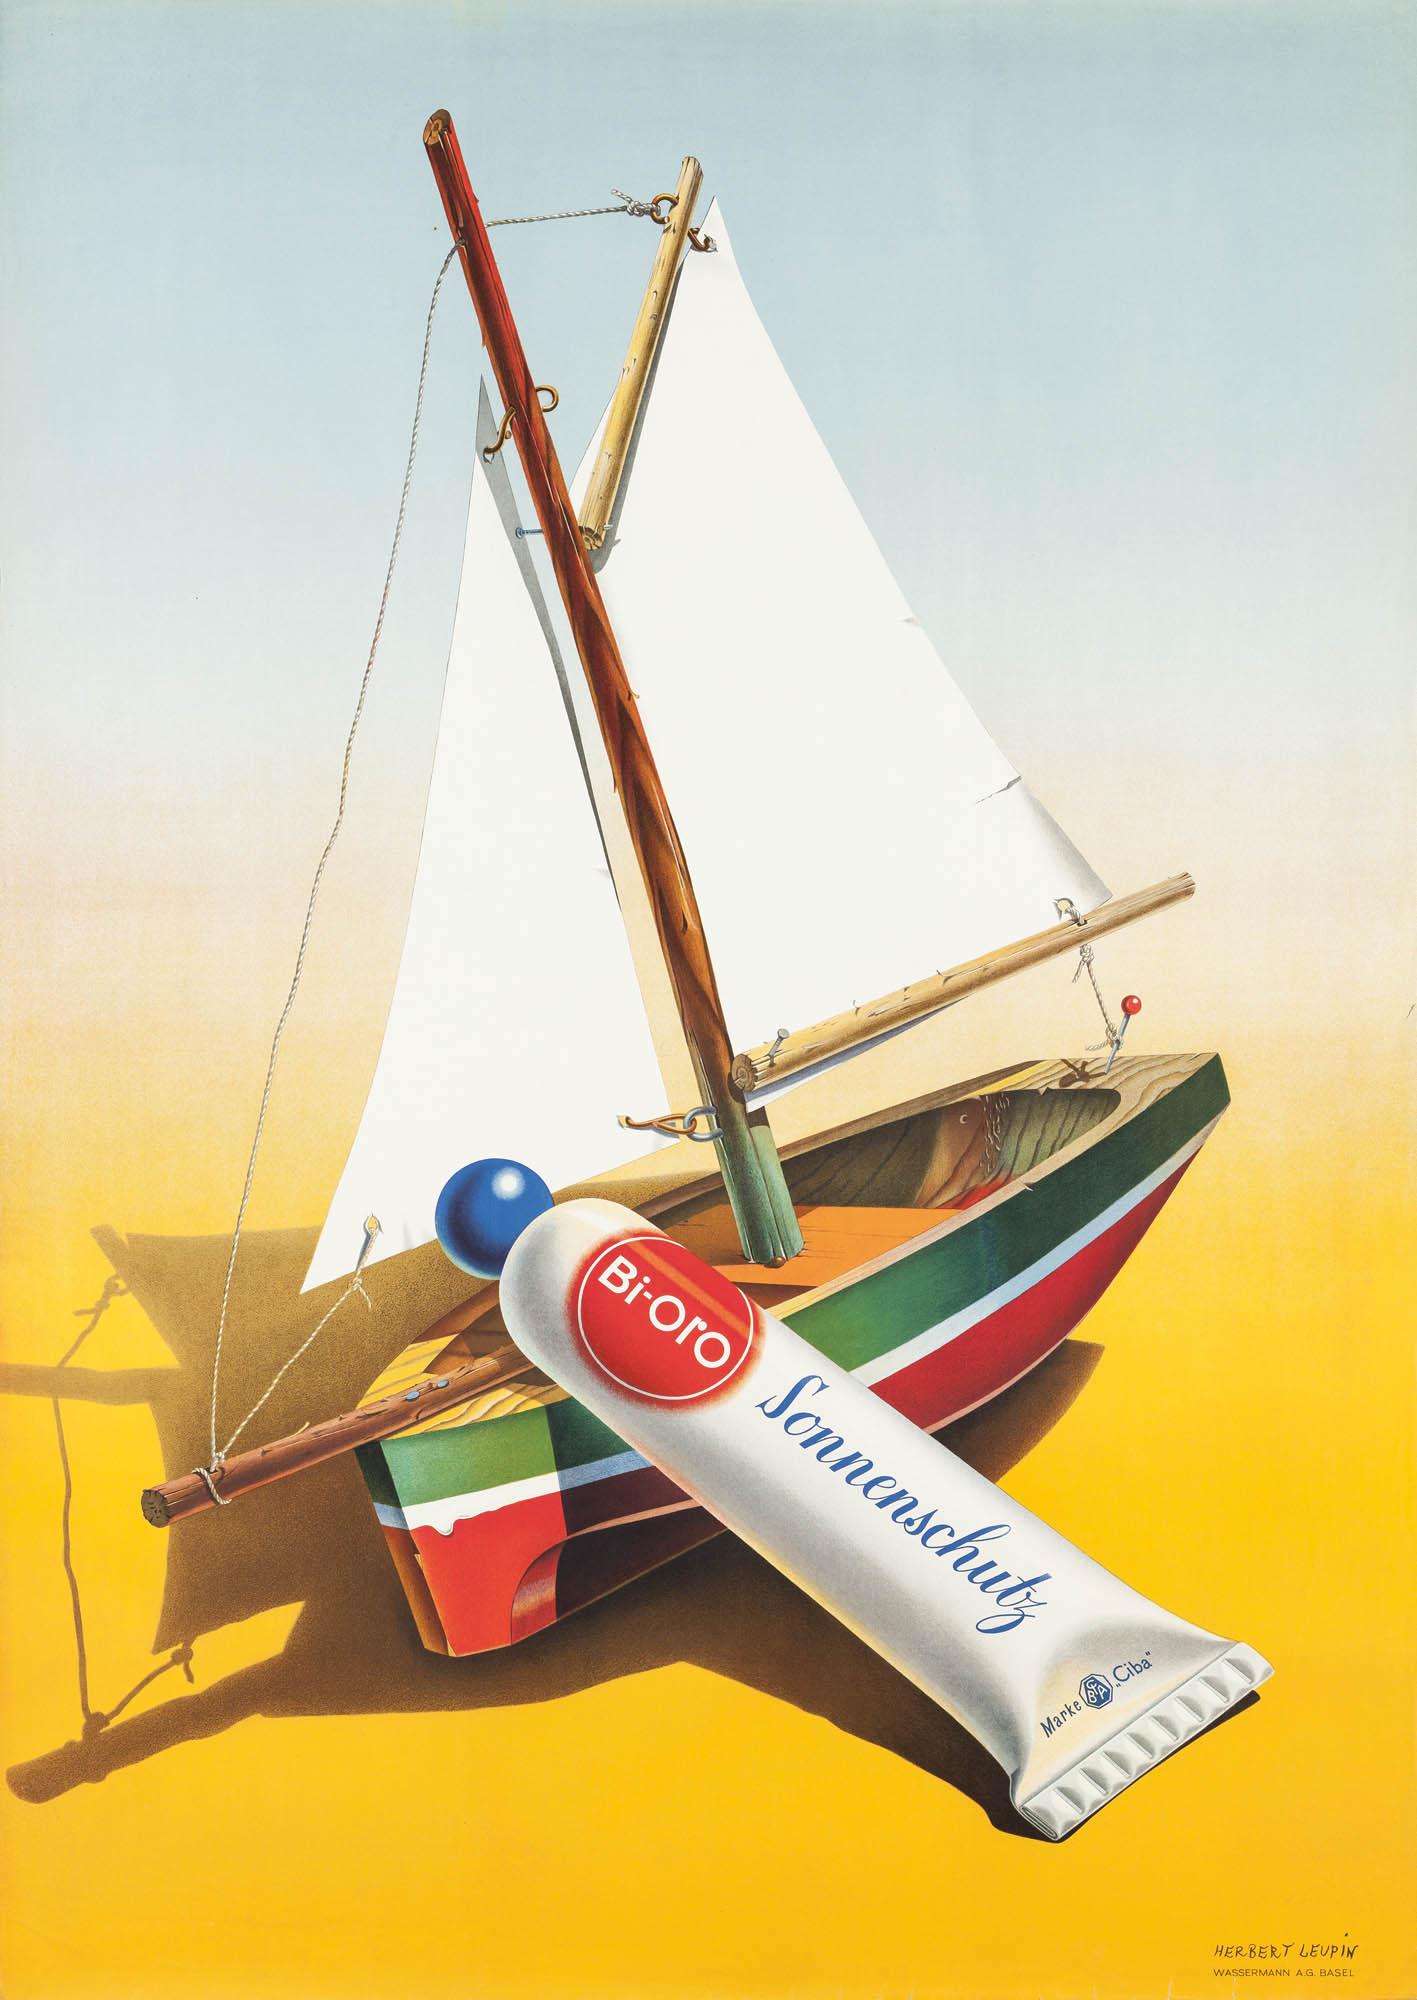 Sonnenschutz Bi Oro Niklaus Stoecklin Plakat